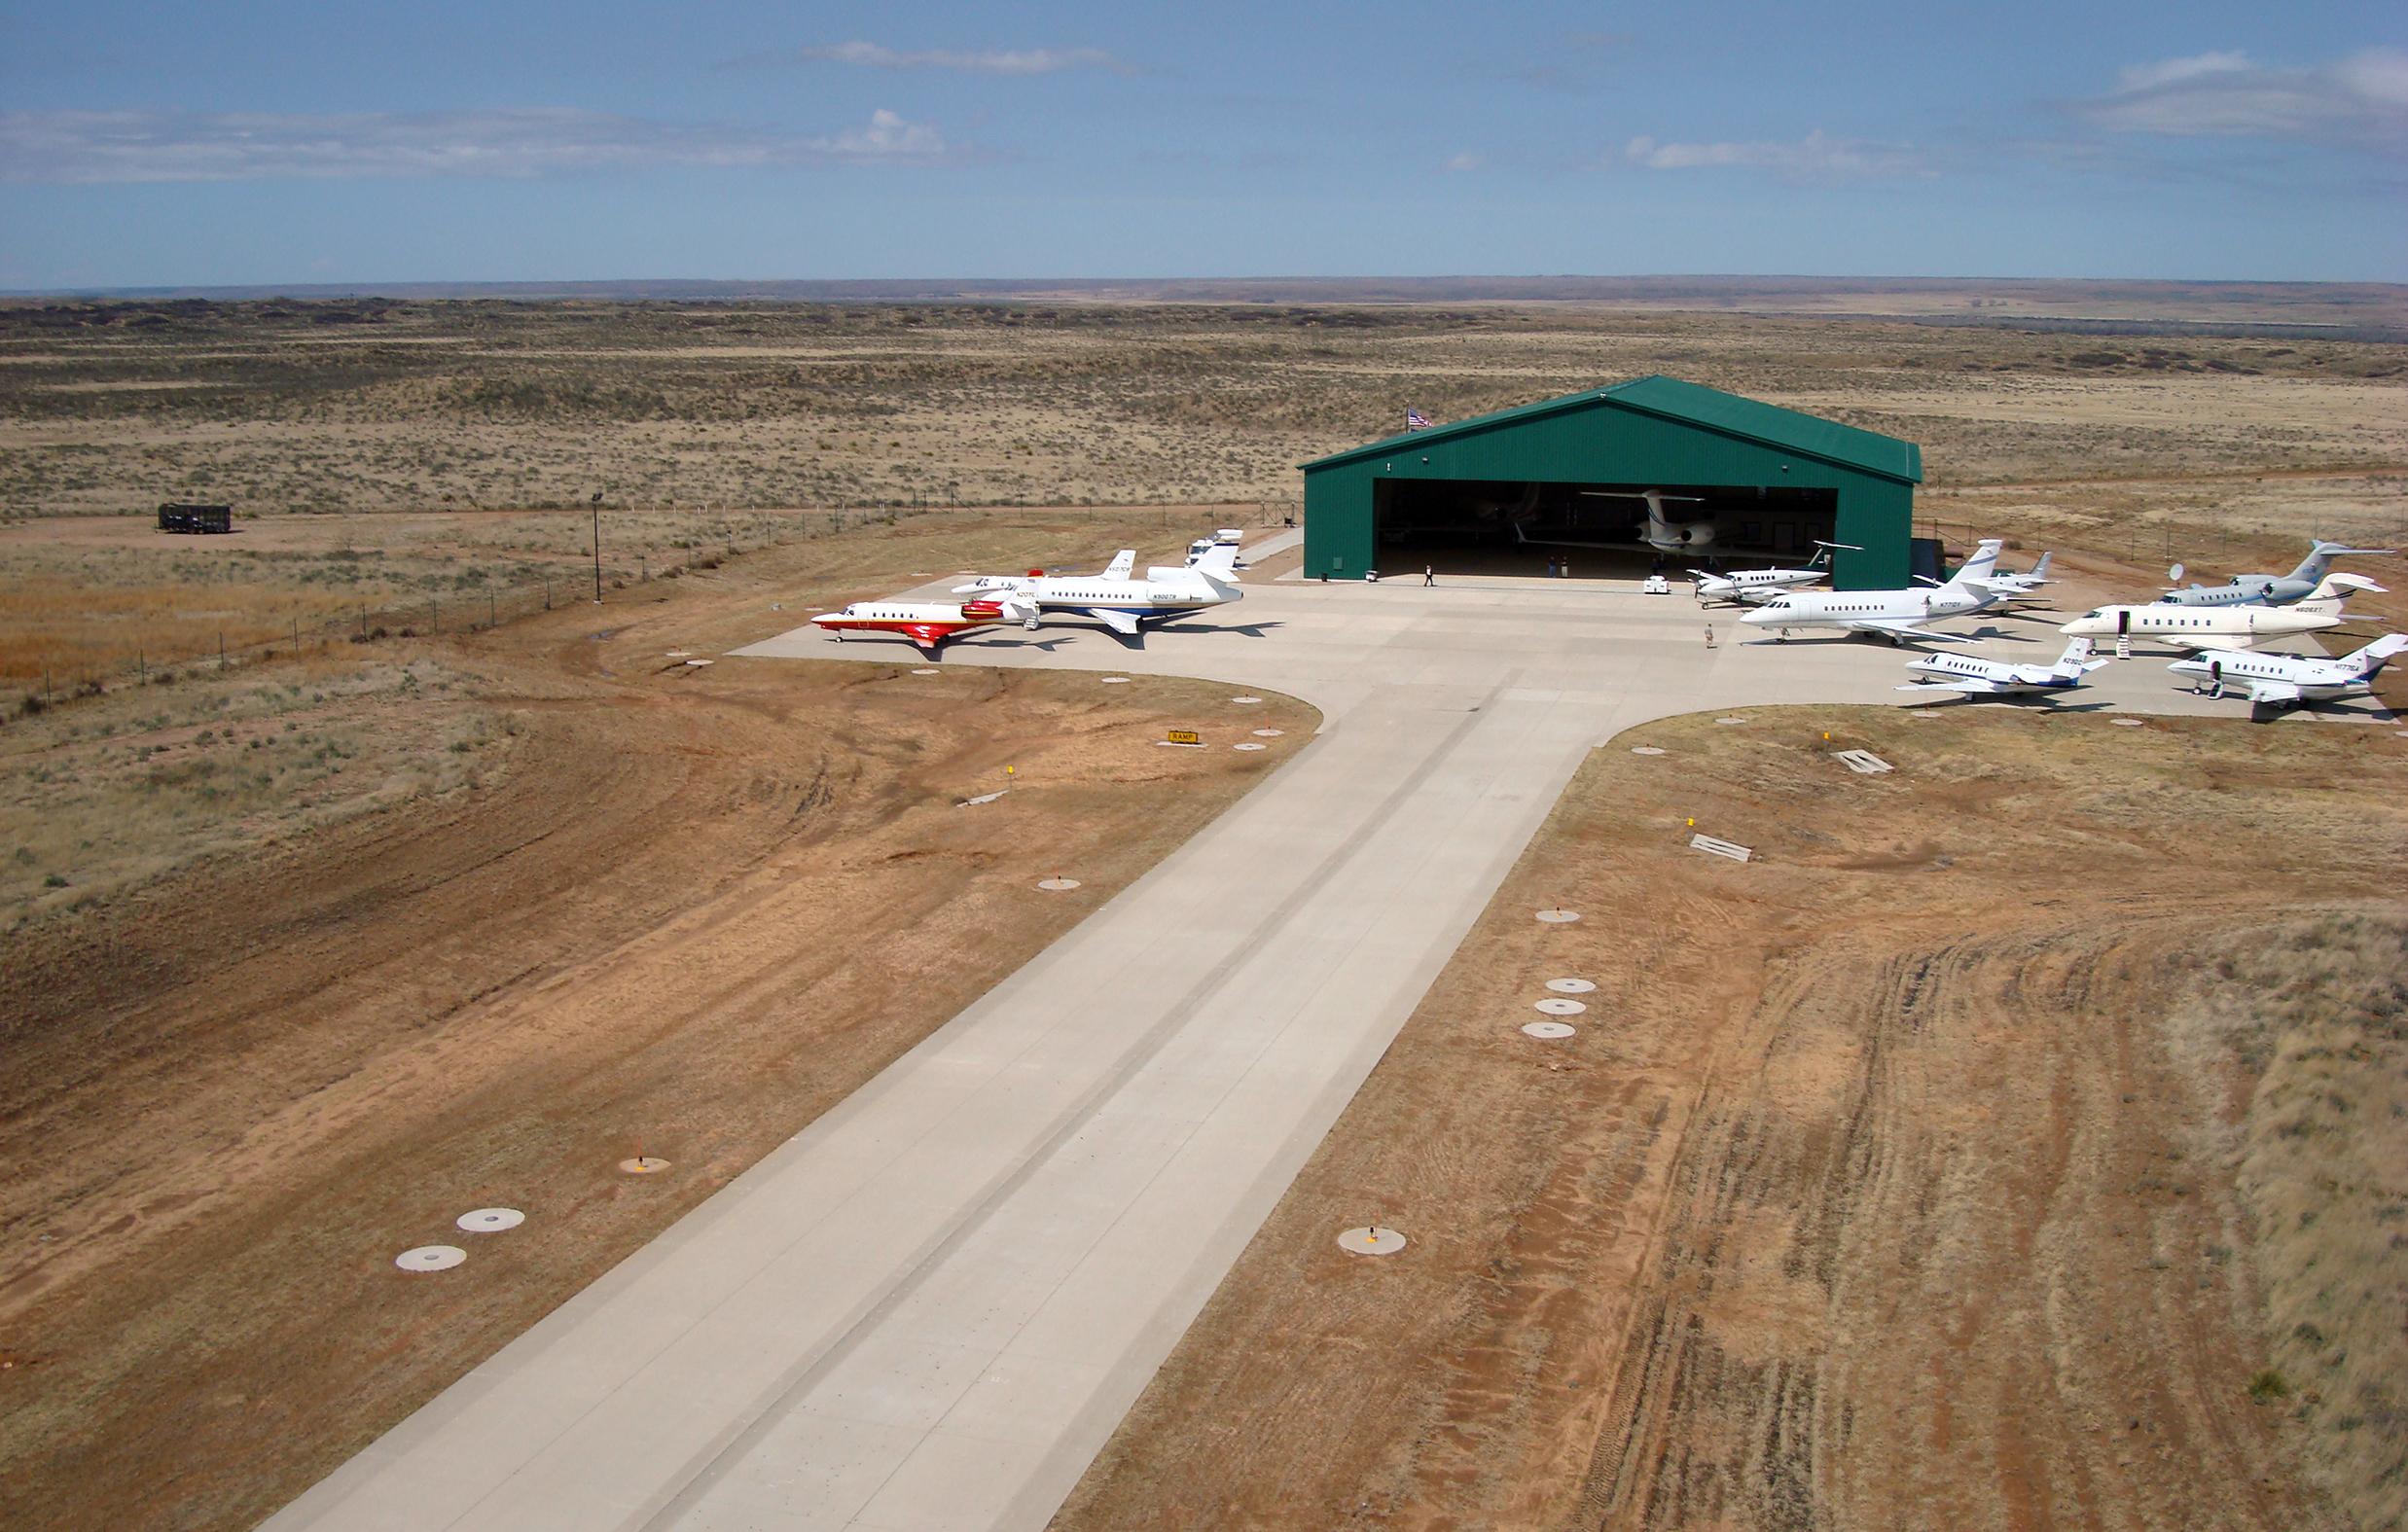 171204-t-boone-pickens-mesa-vista-ranch-20